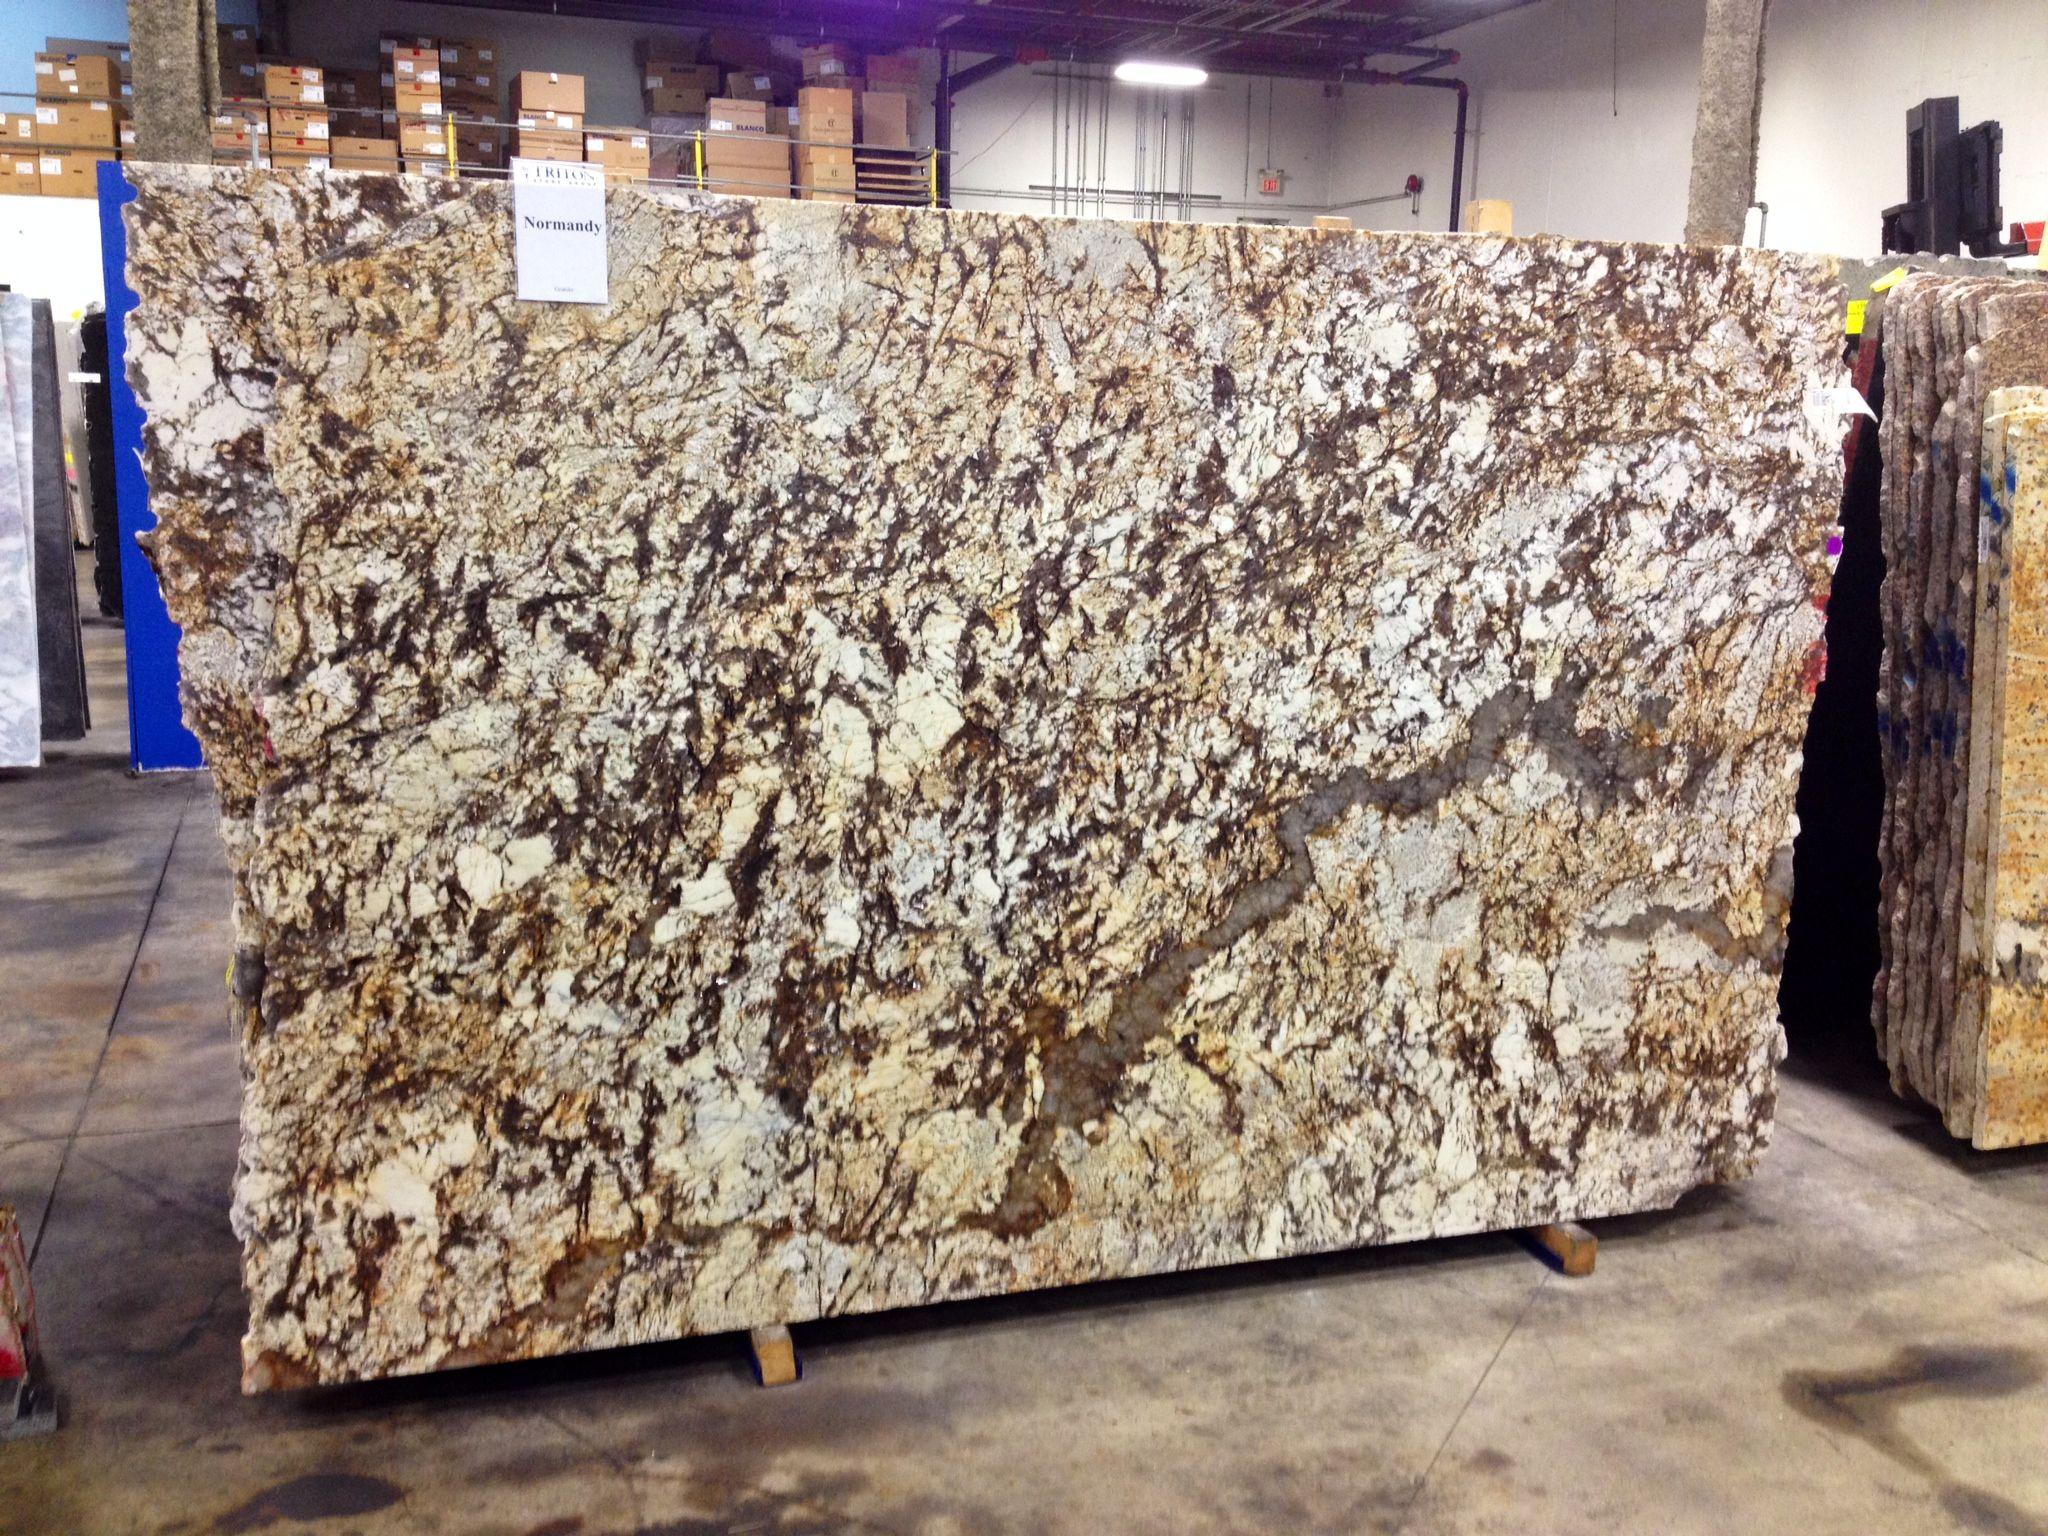 Normandy Granite   Contact @Triton Stone Group Of Louisville At  502.267.9303 #TritonStoneLou #Granite #NaturalStone #LouisvilleKY # Countertops #Kitchen ...